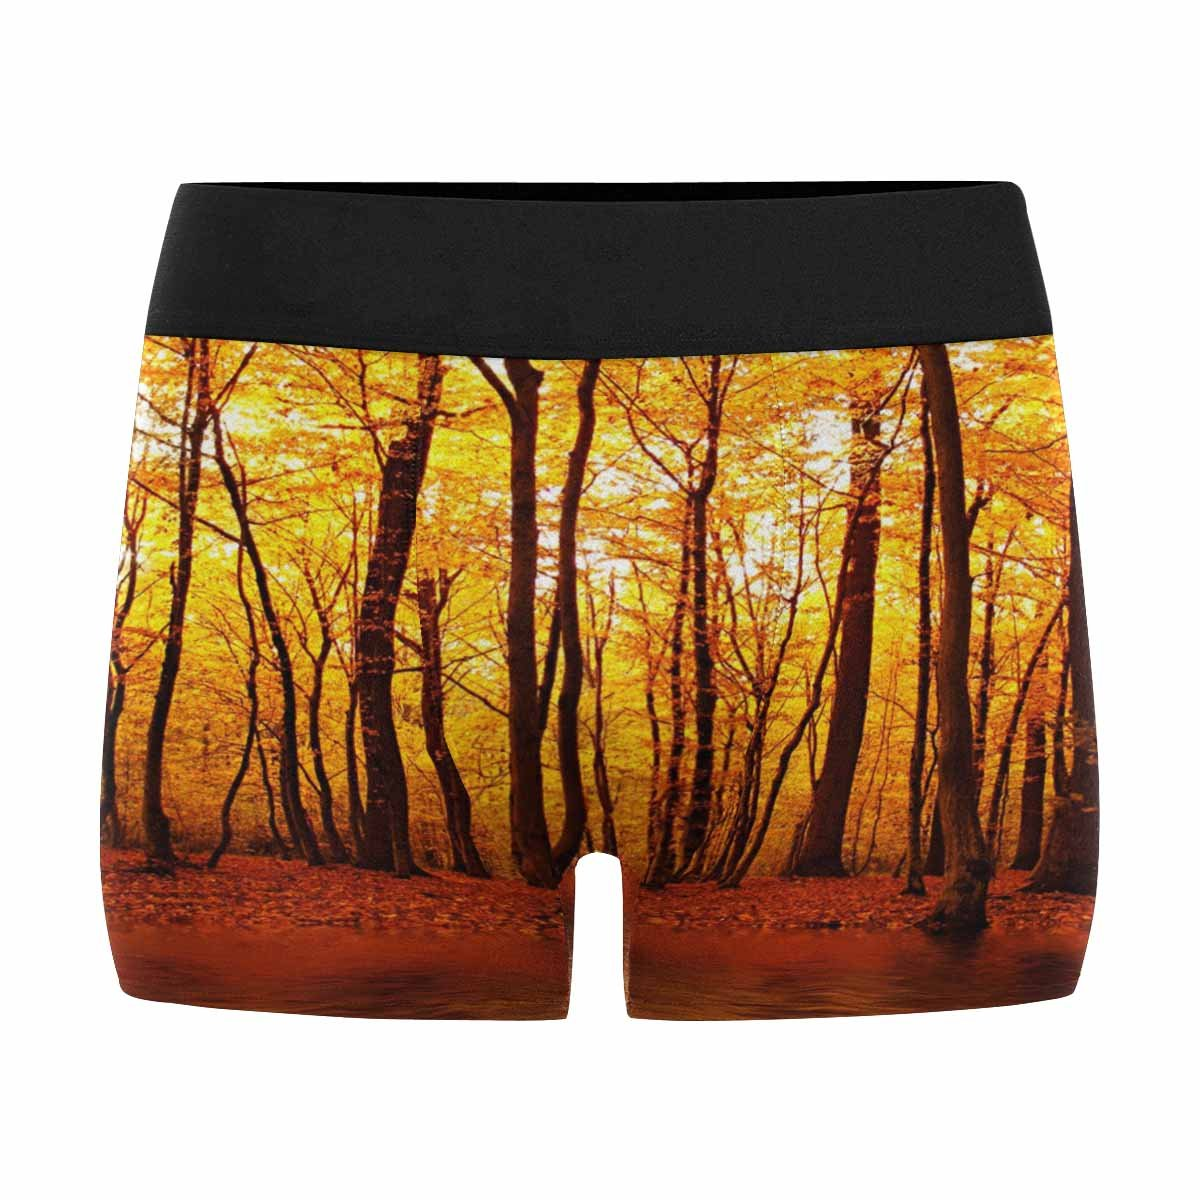 INTERESTPRINT Mens Boxer Briefs Underwear Lake in Autumn Forest Beautiful Nature XS-3XL